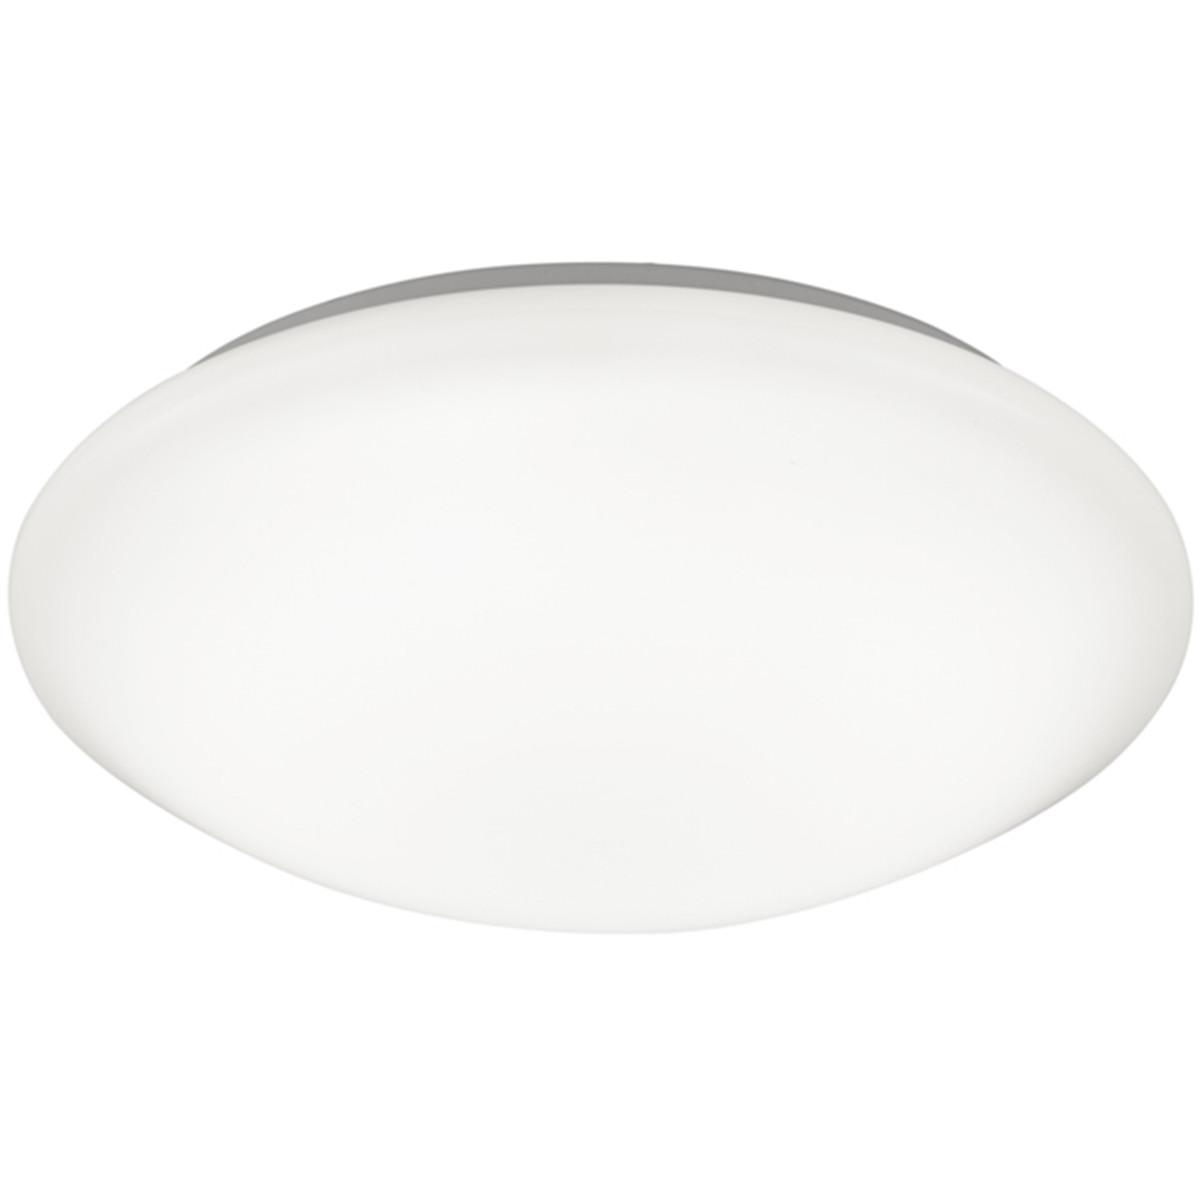 LED Plafondlamp - Trion Conviton - Opbouw Rond 11W - Warm Wit 3000K - Dimbaar - Mat Wit - Acryl